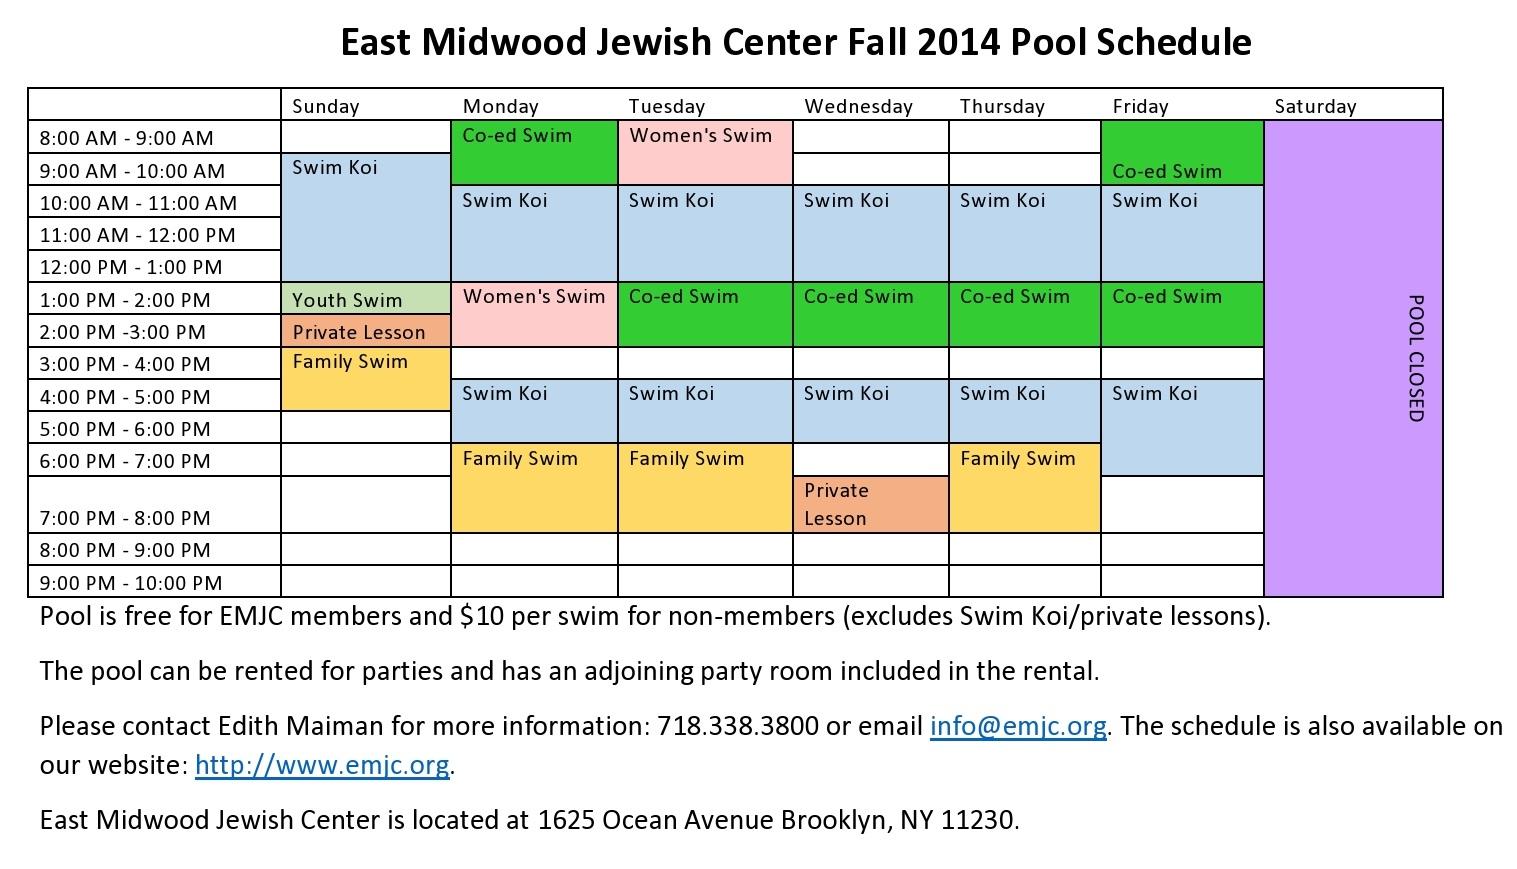 emjc pool schedule 2014